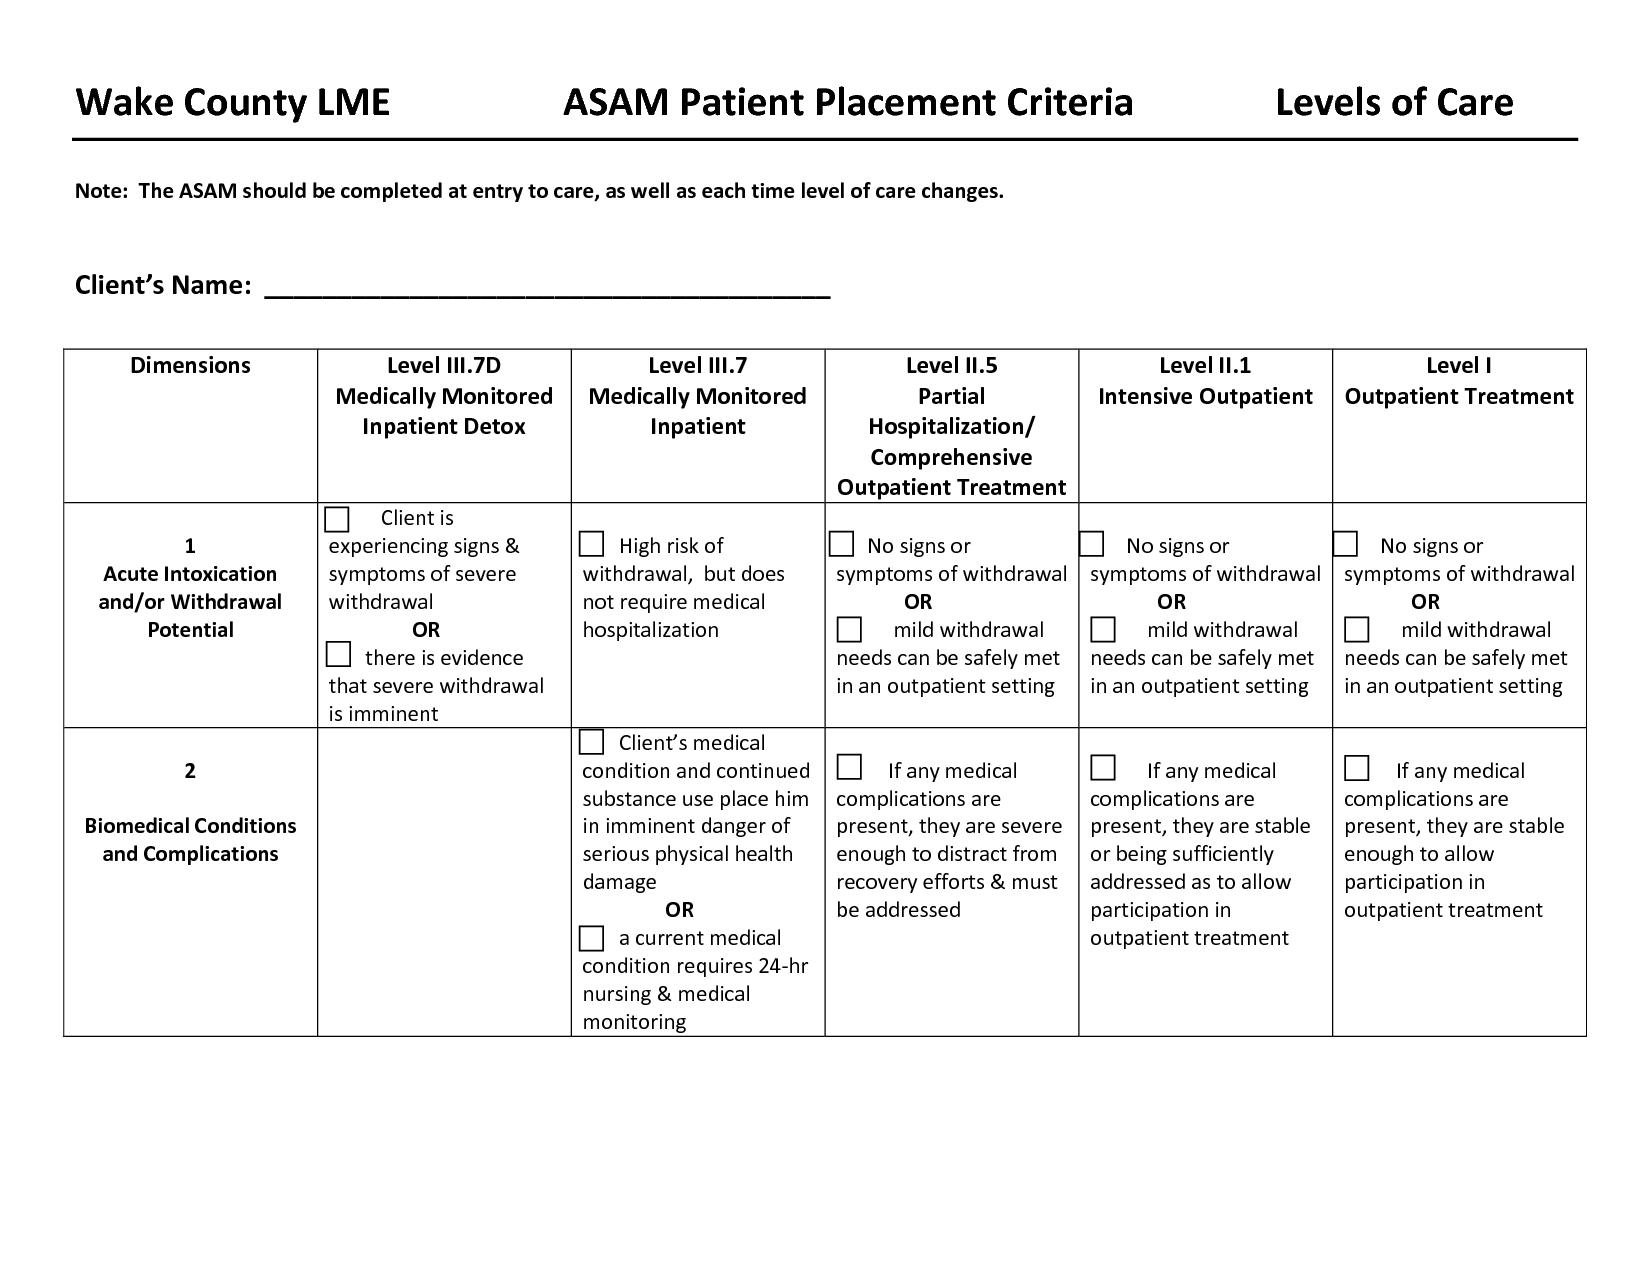 Asam Levels Of Care Chart